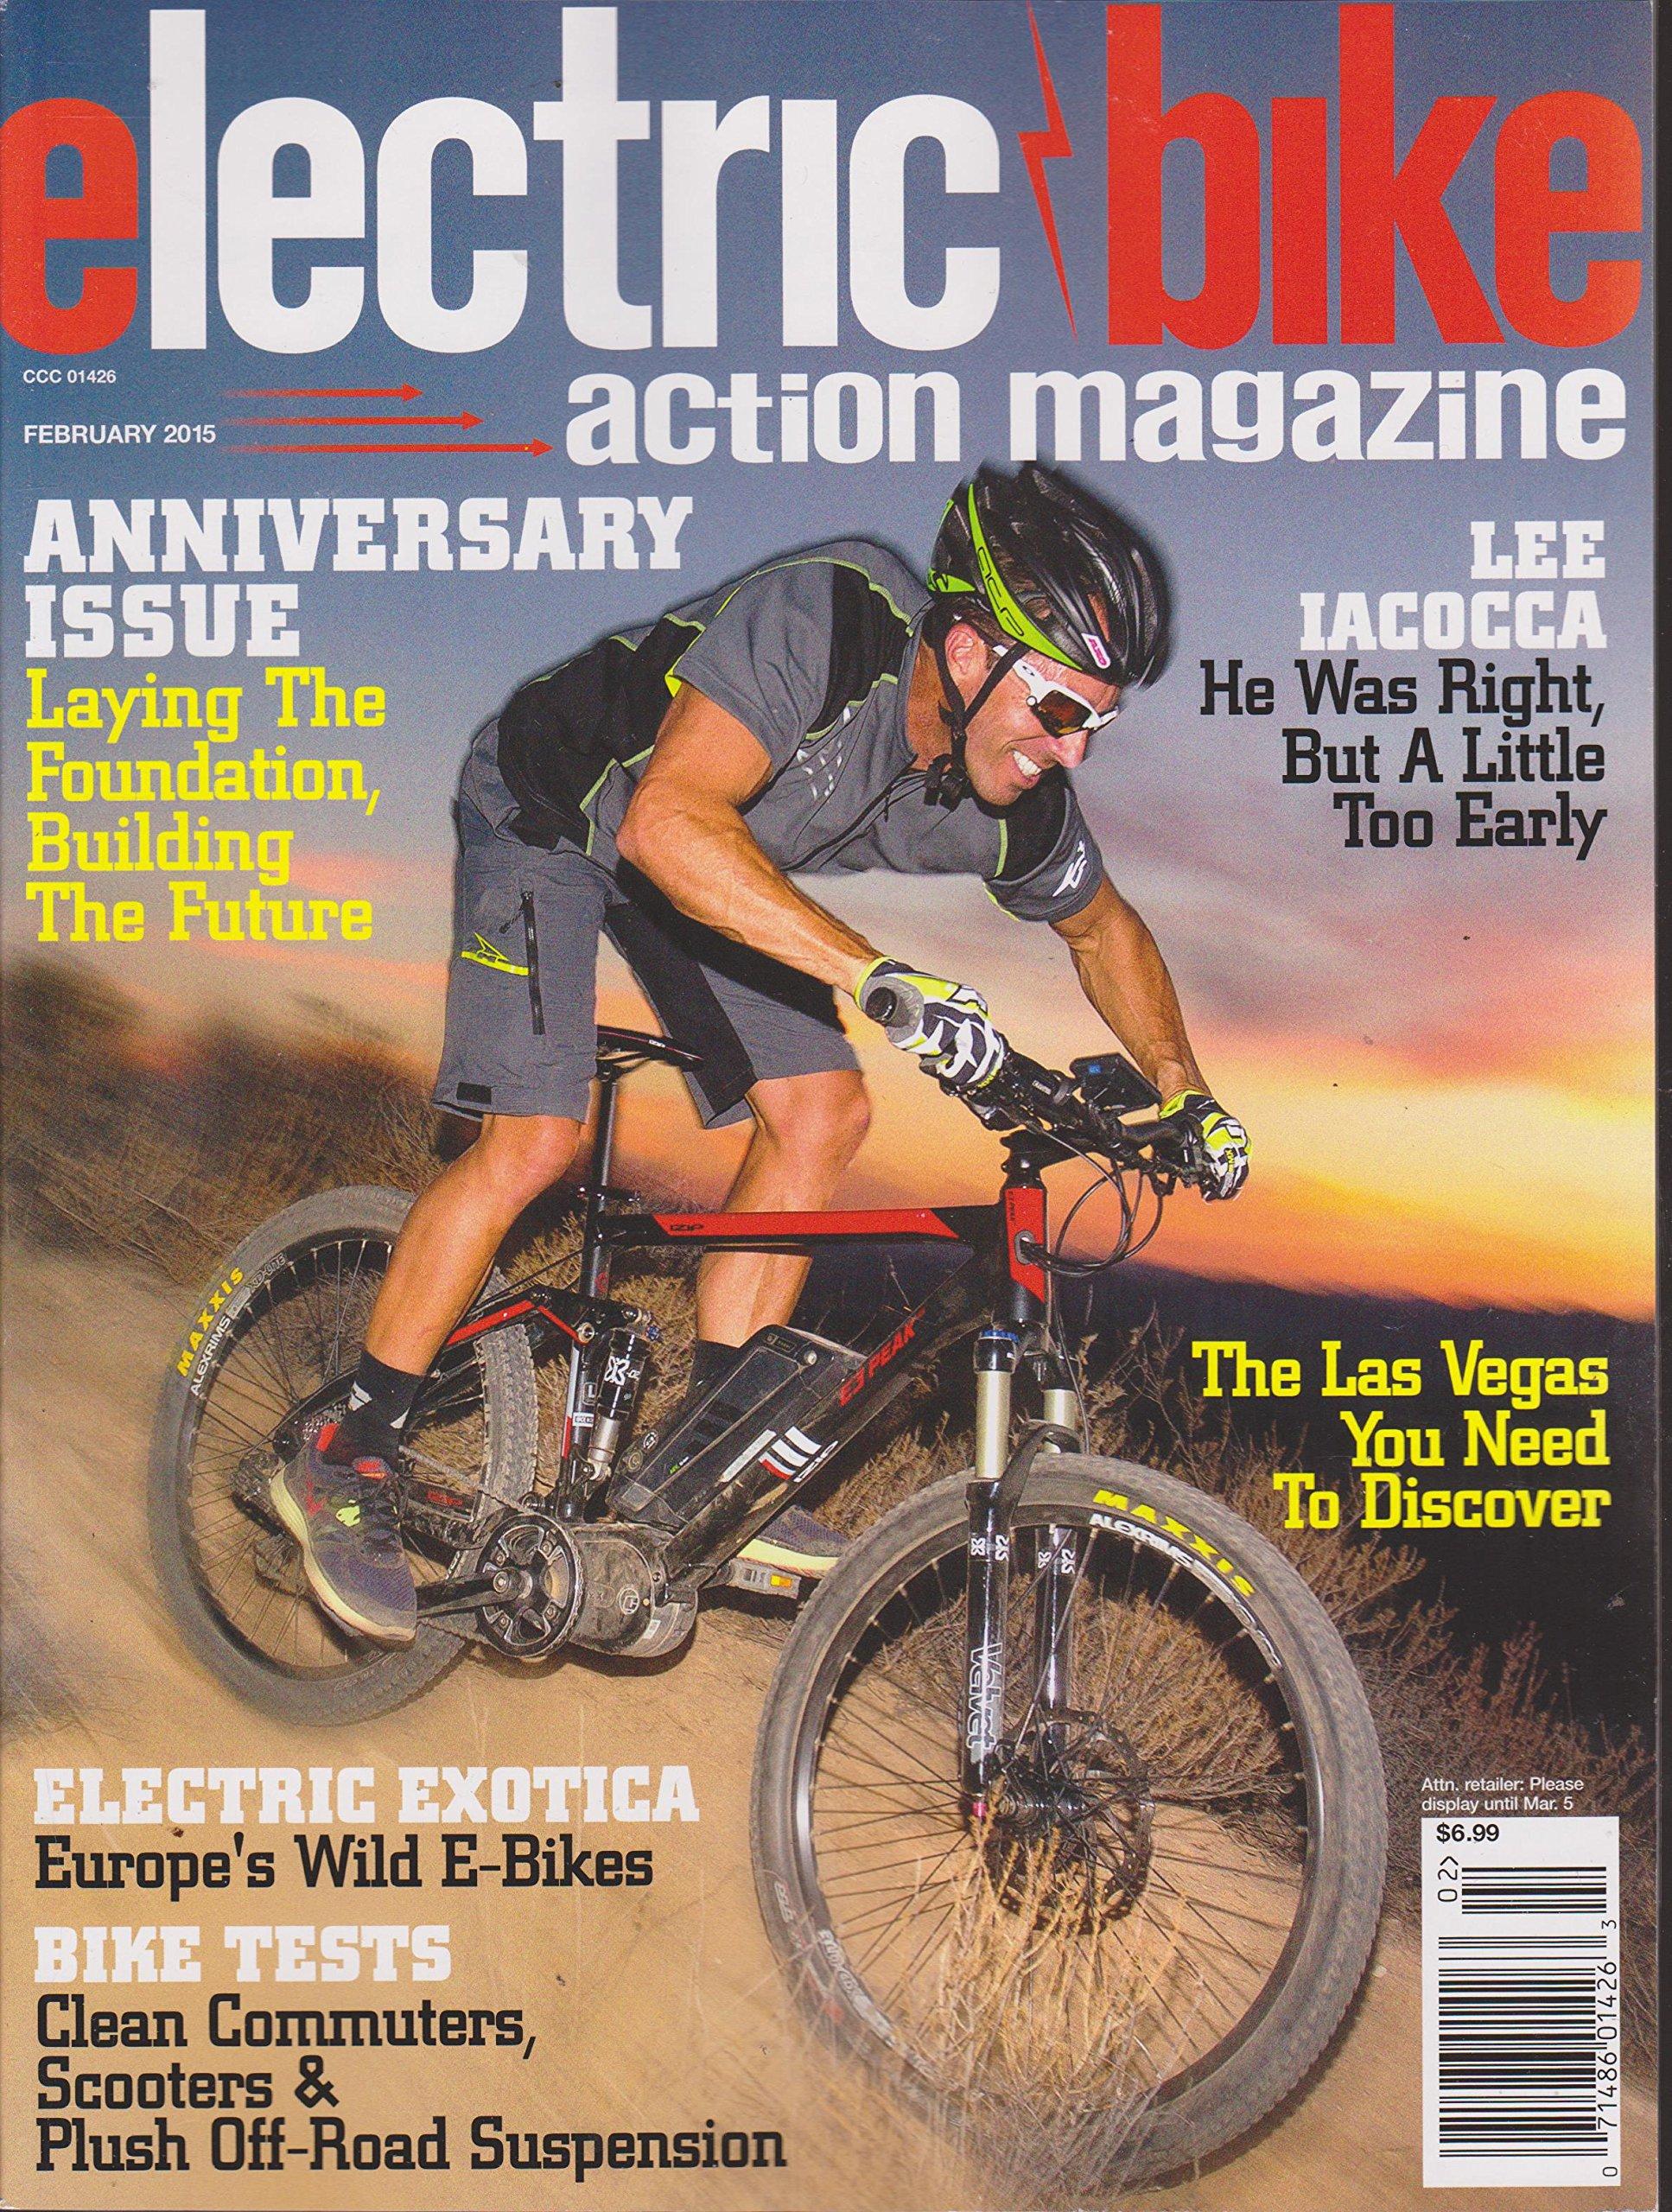 Electric Bike Action Magazine February 2015 pdf